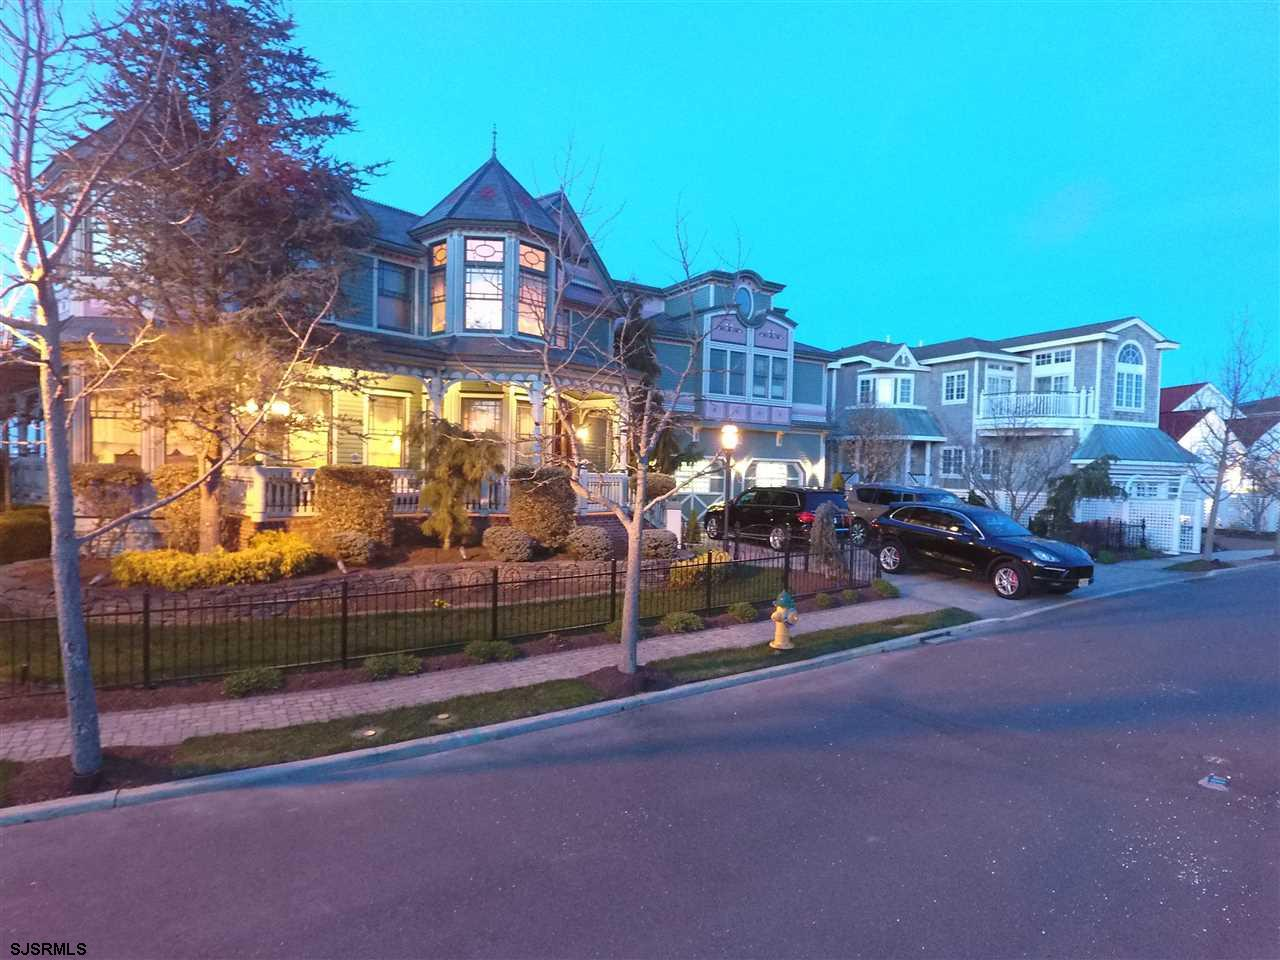 279 Bayshore Dr, Ocean City, NJ 08226